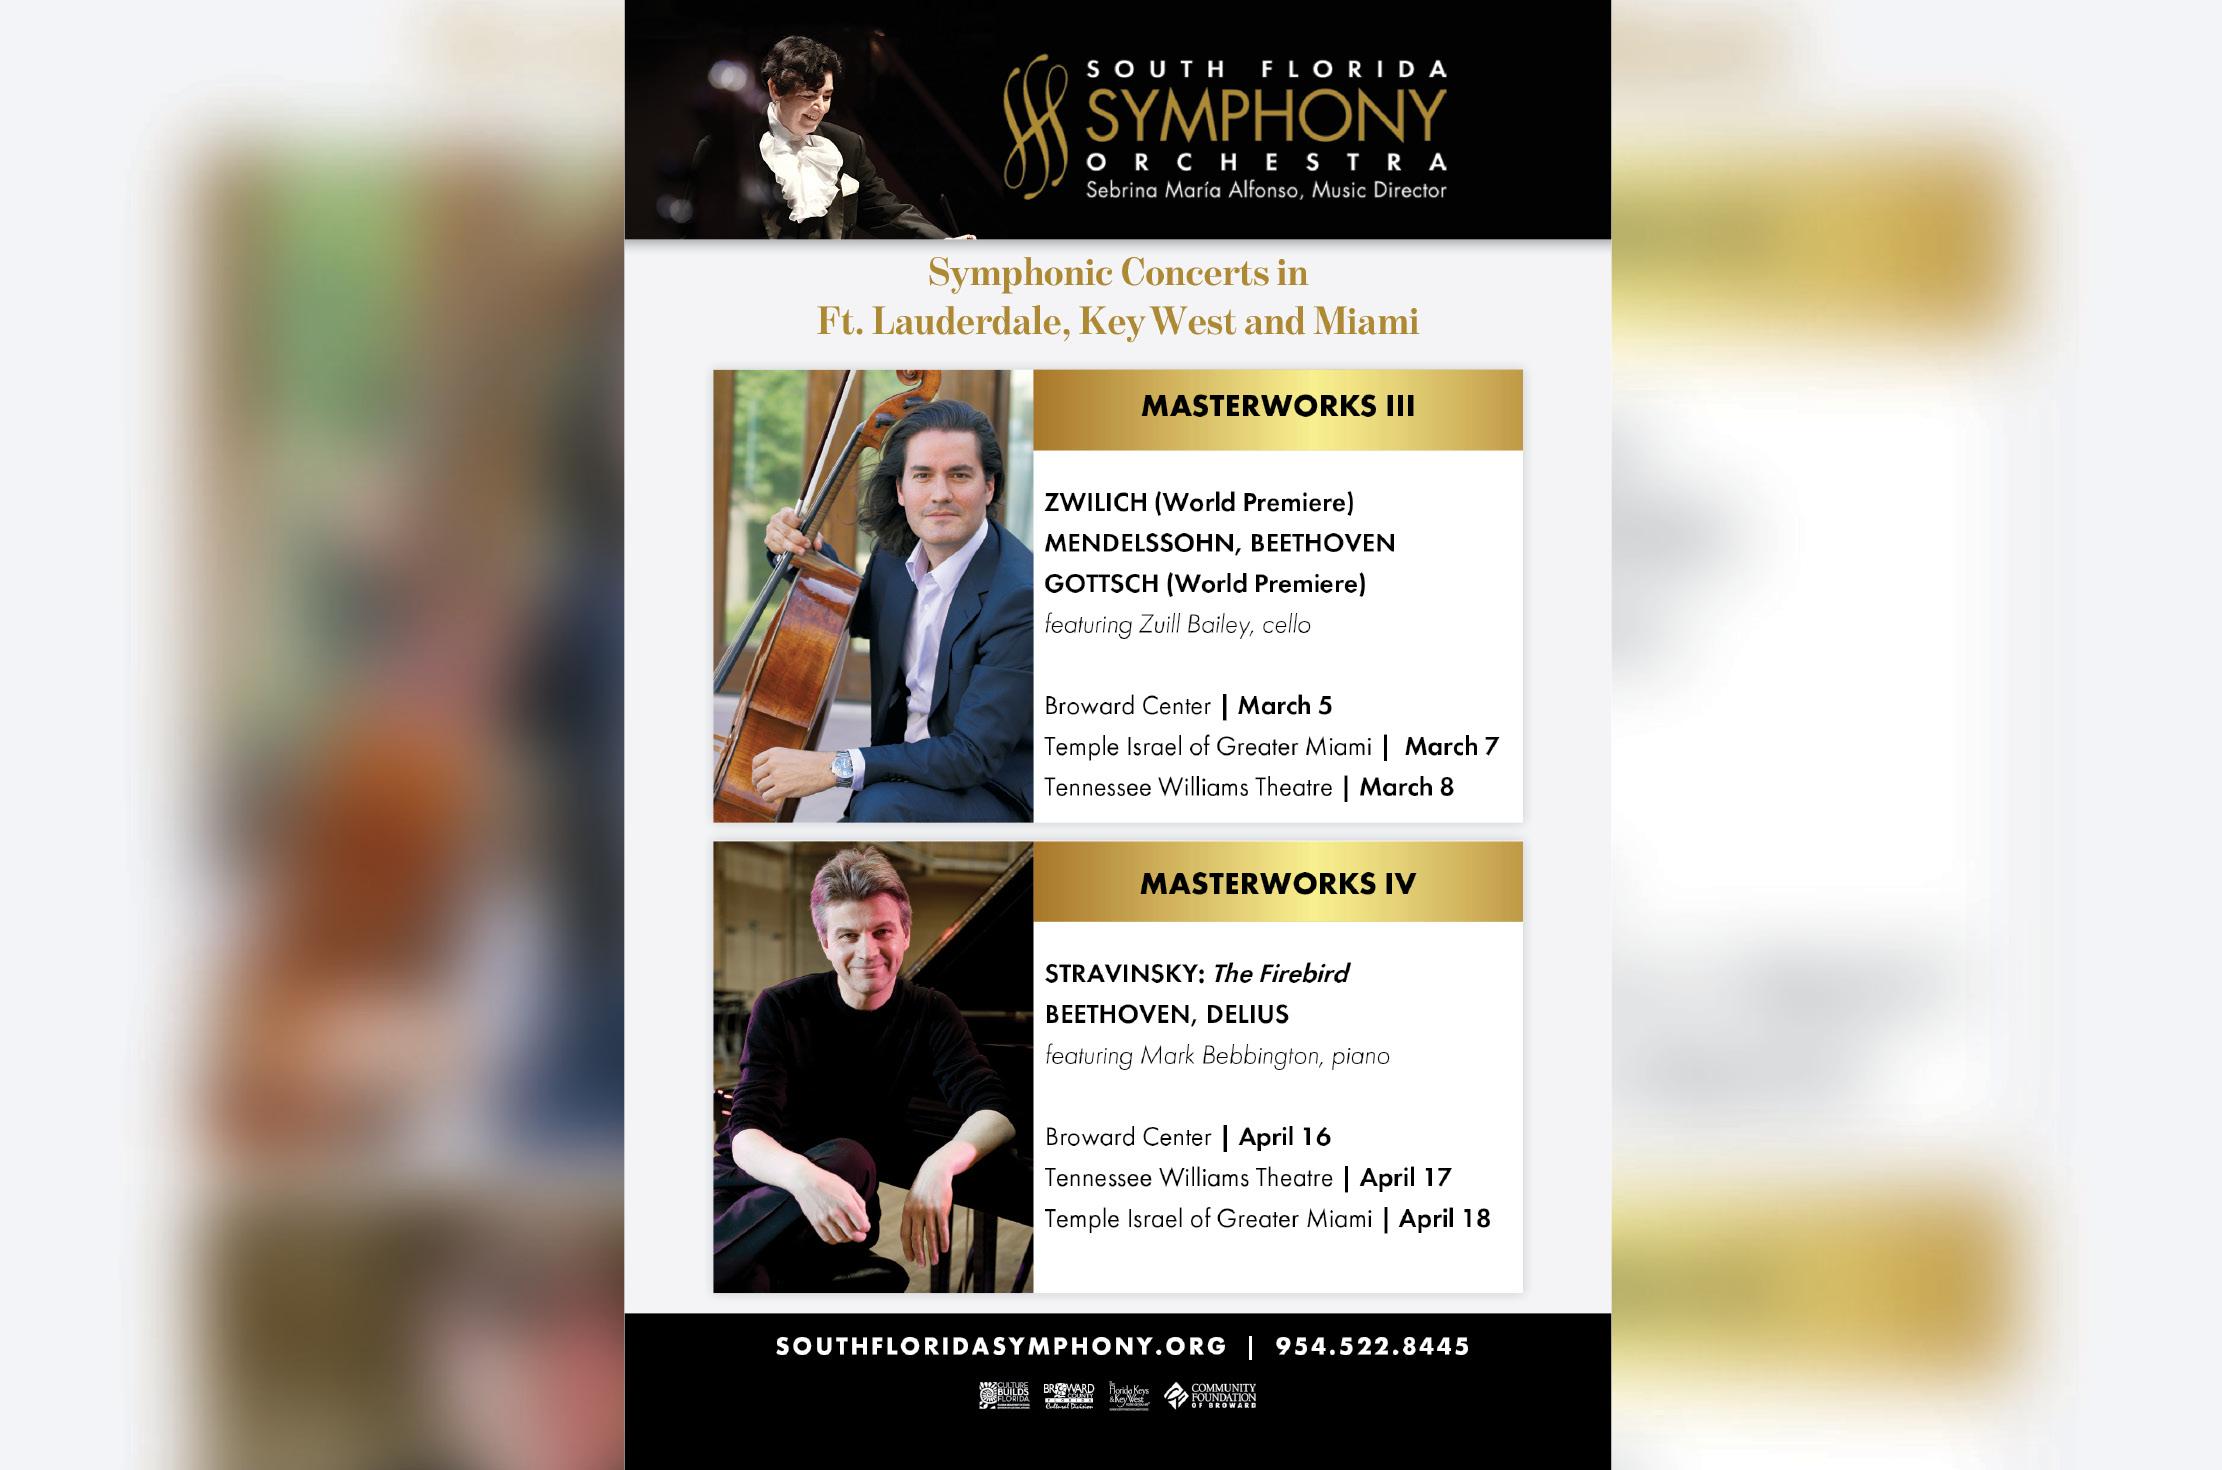 The South Florida Symphony Orchestra Welcomes Mark Bebbington